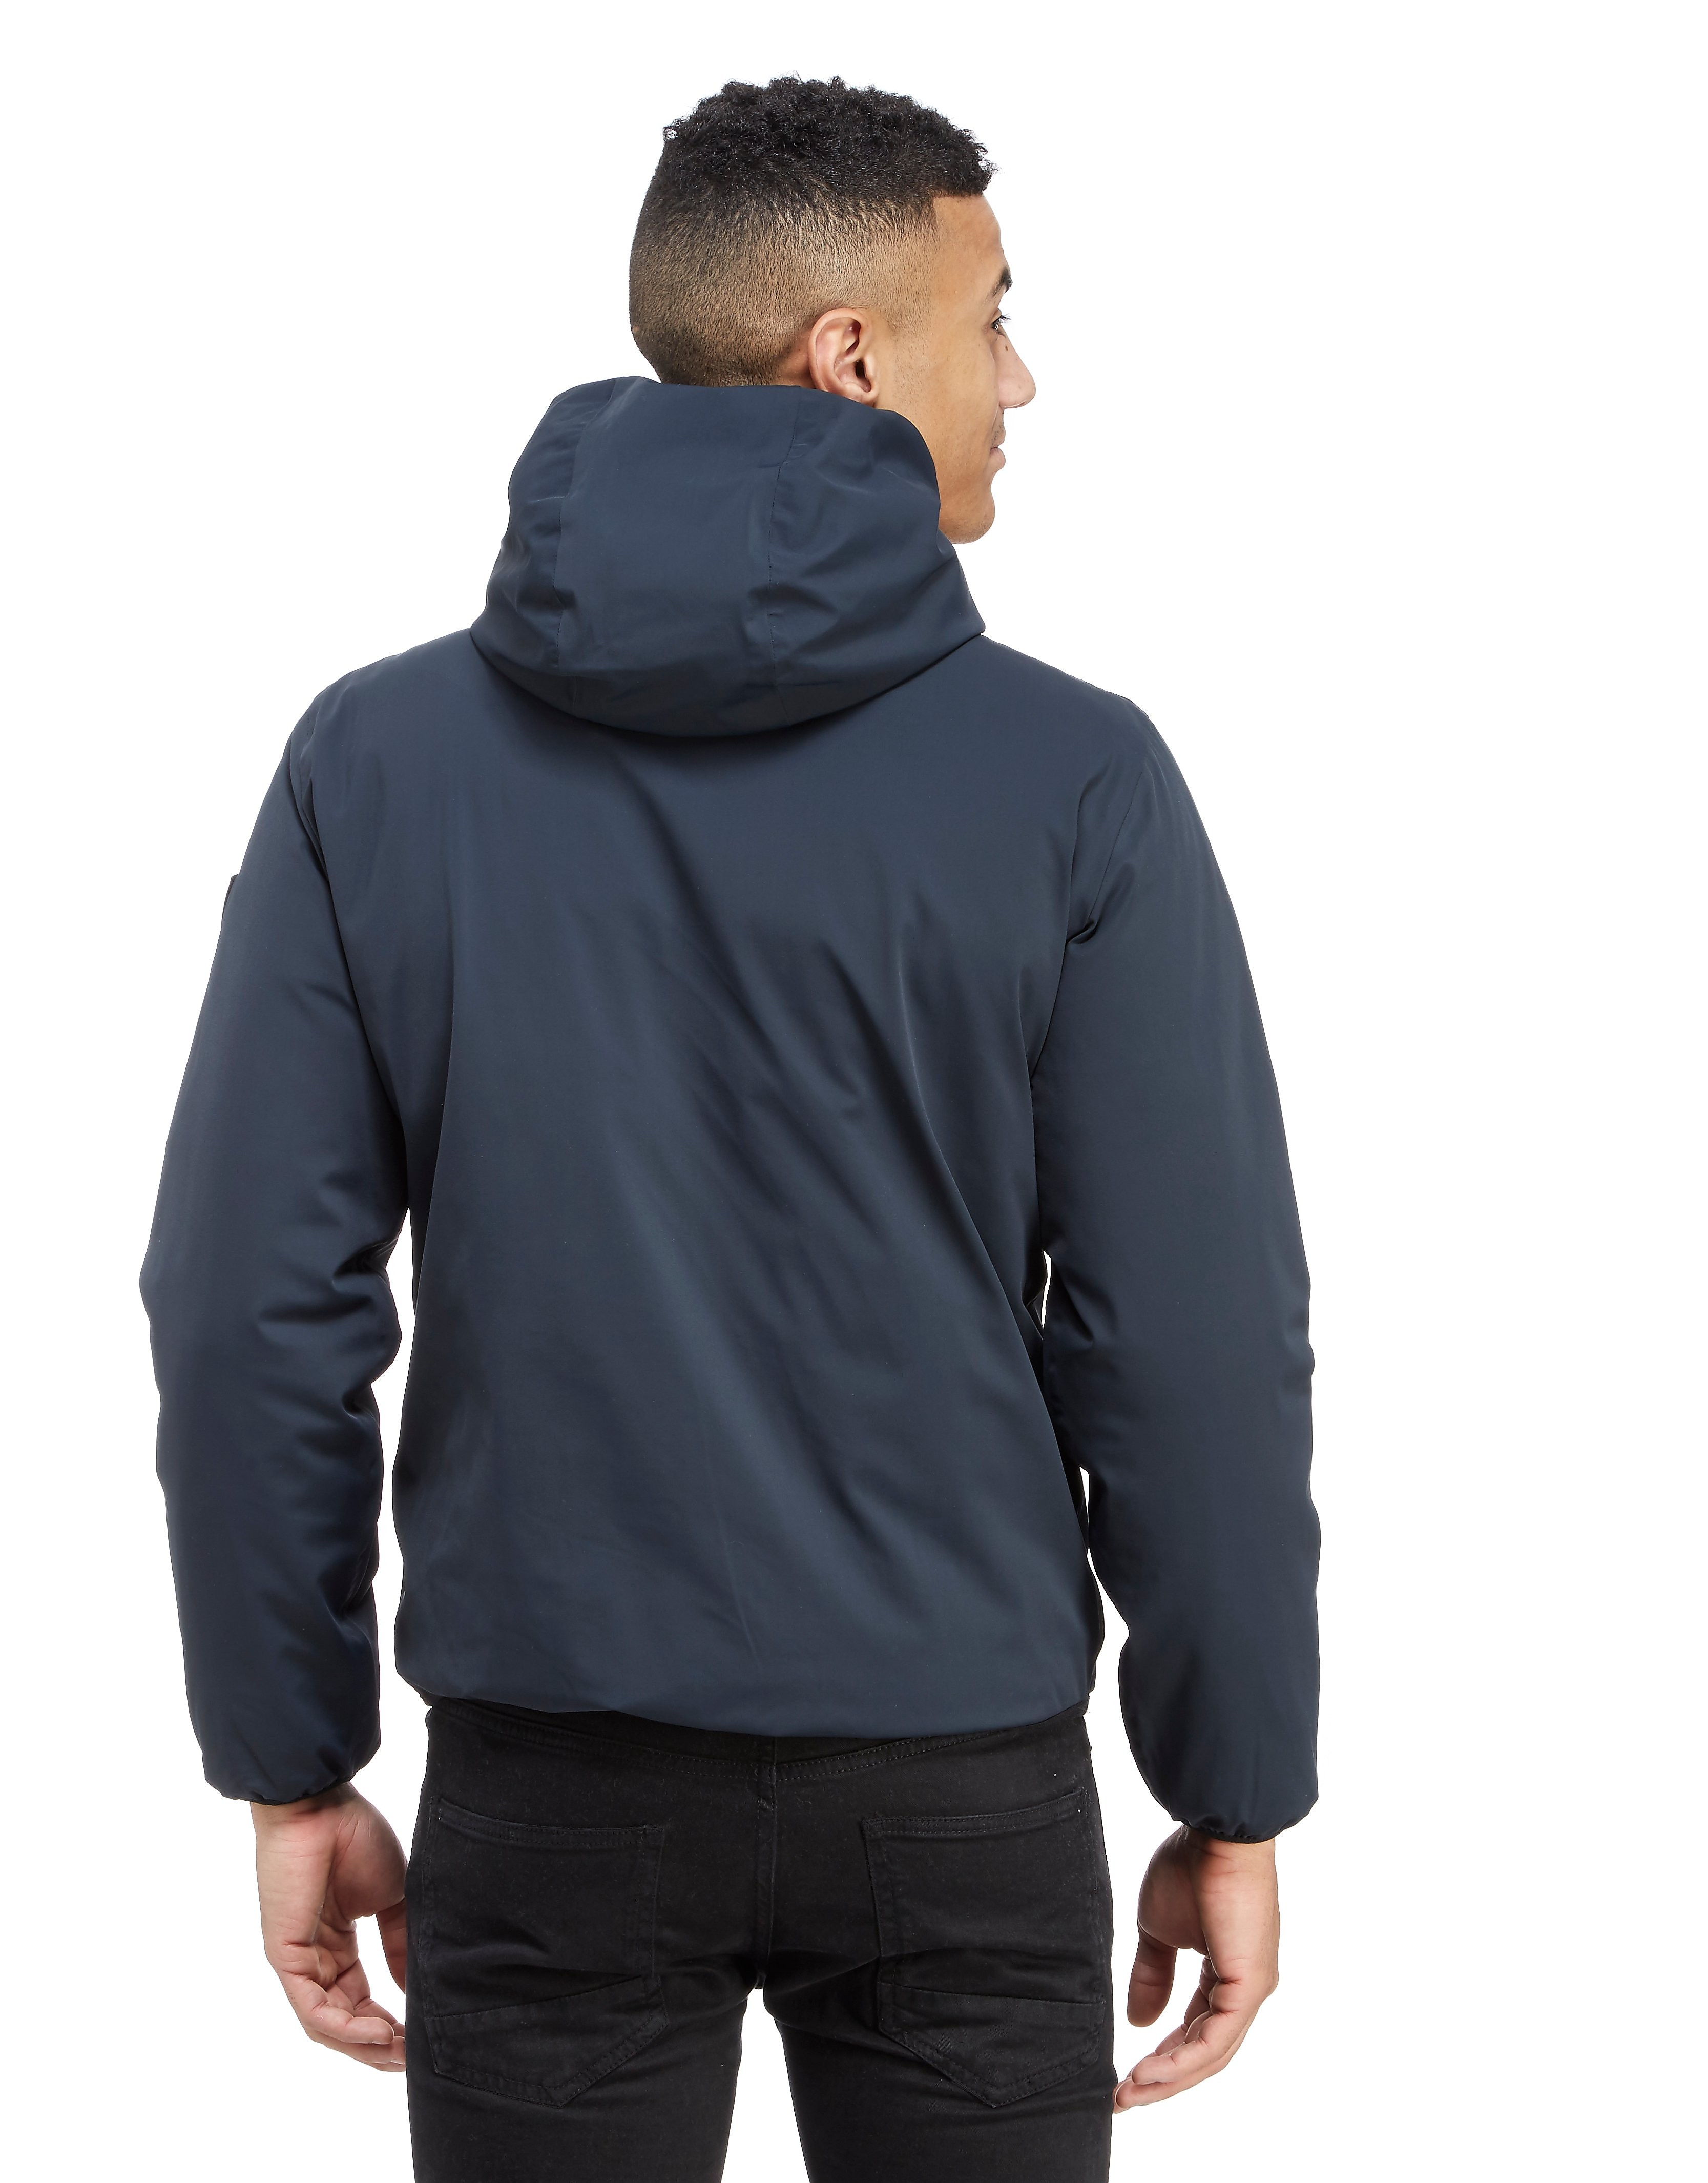 Emporio Armani EA7 Bubble Lined Jacket